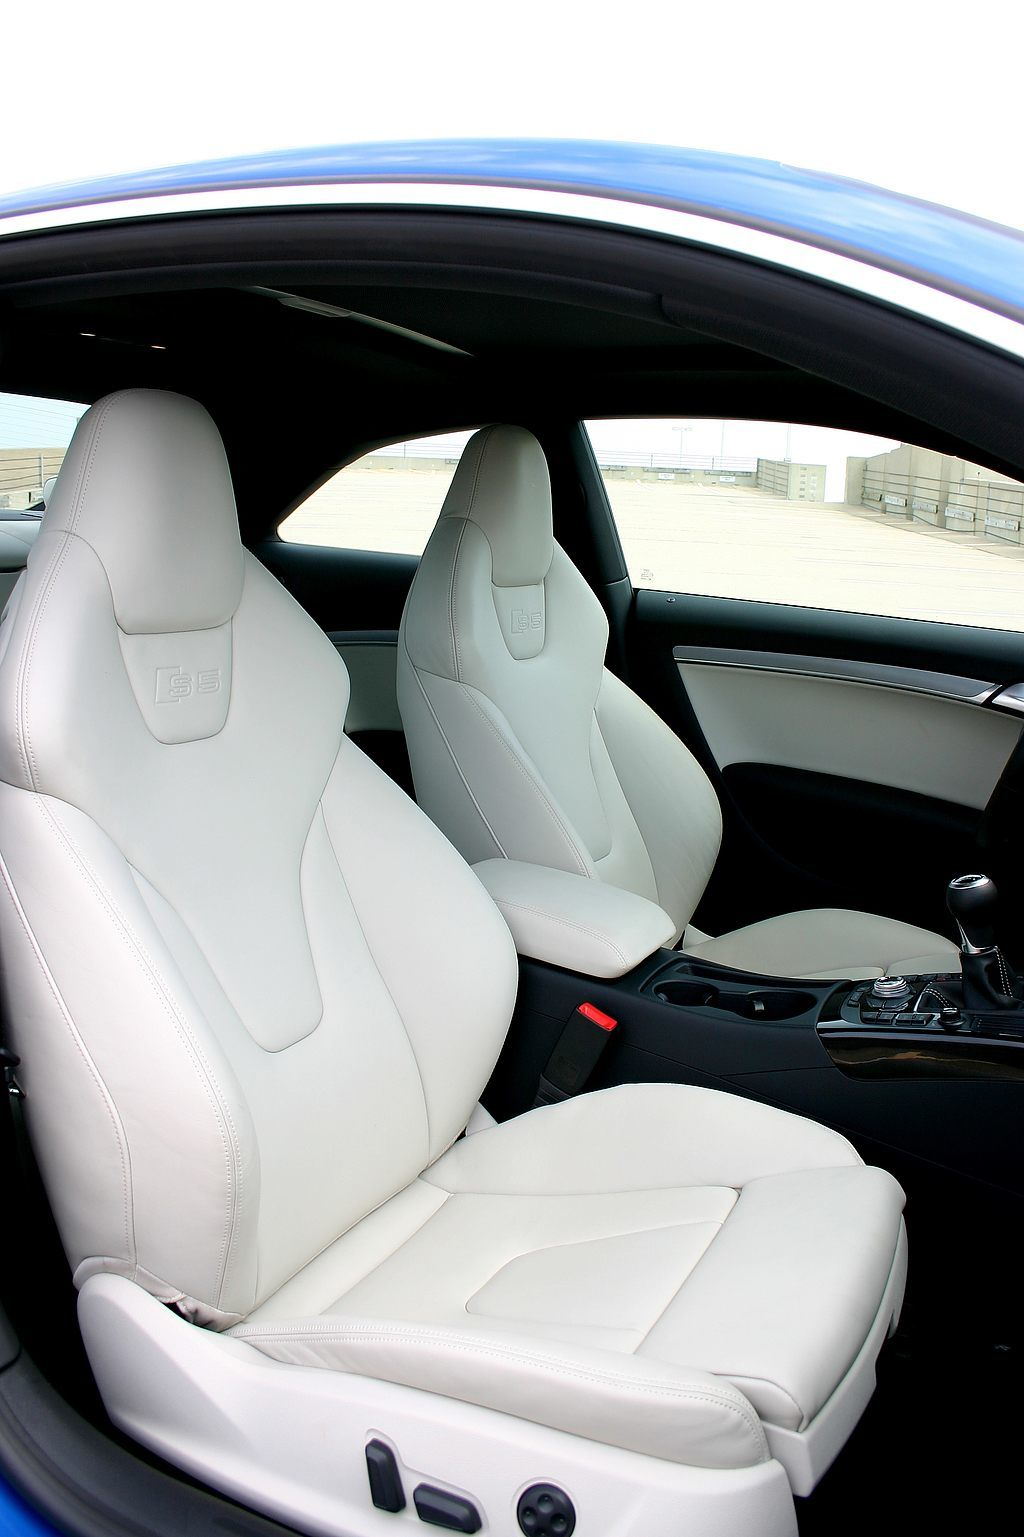 2009 Audi S5 seats